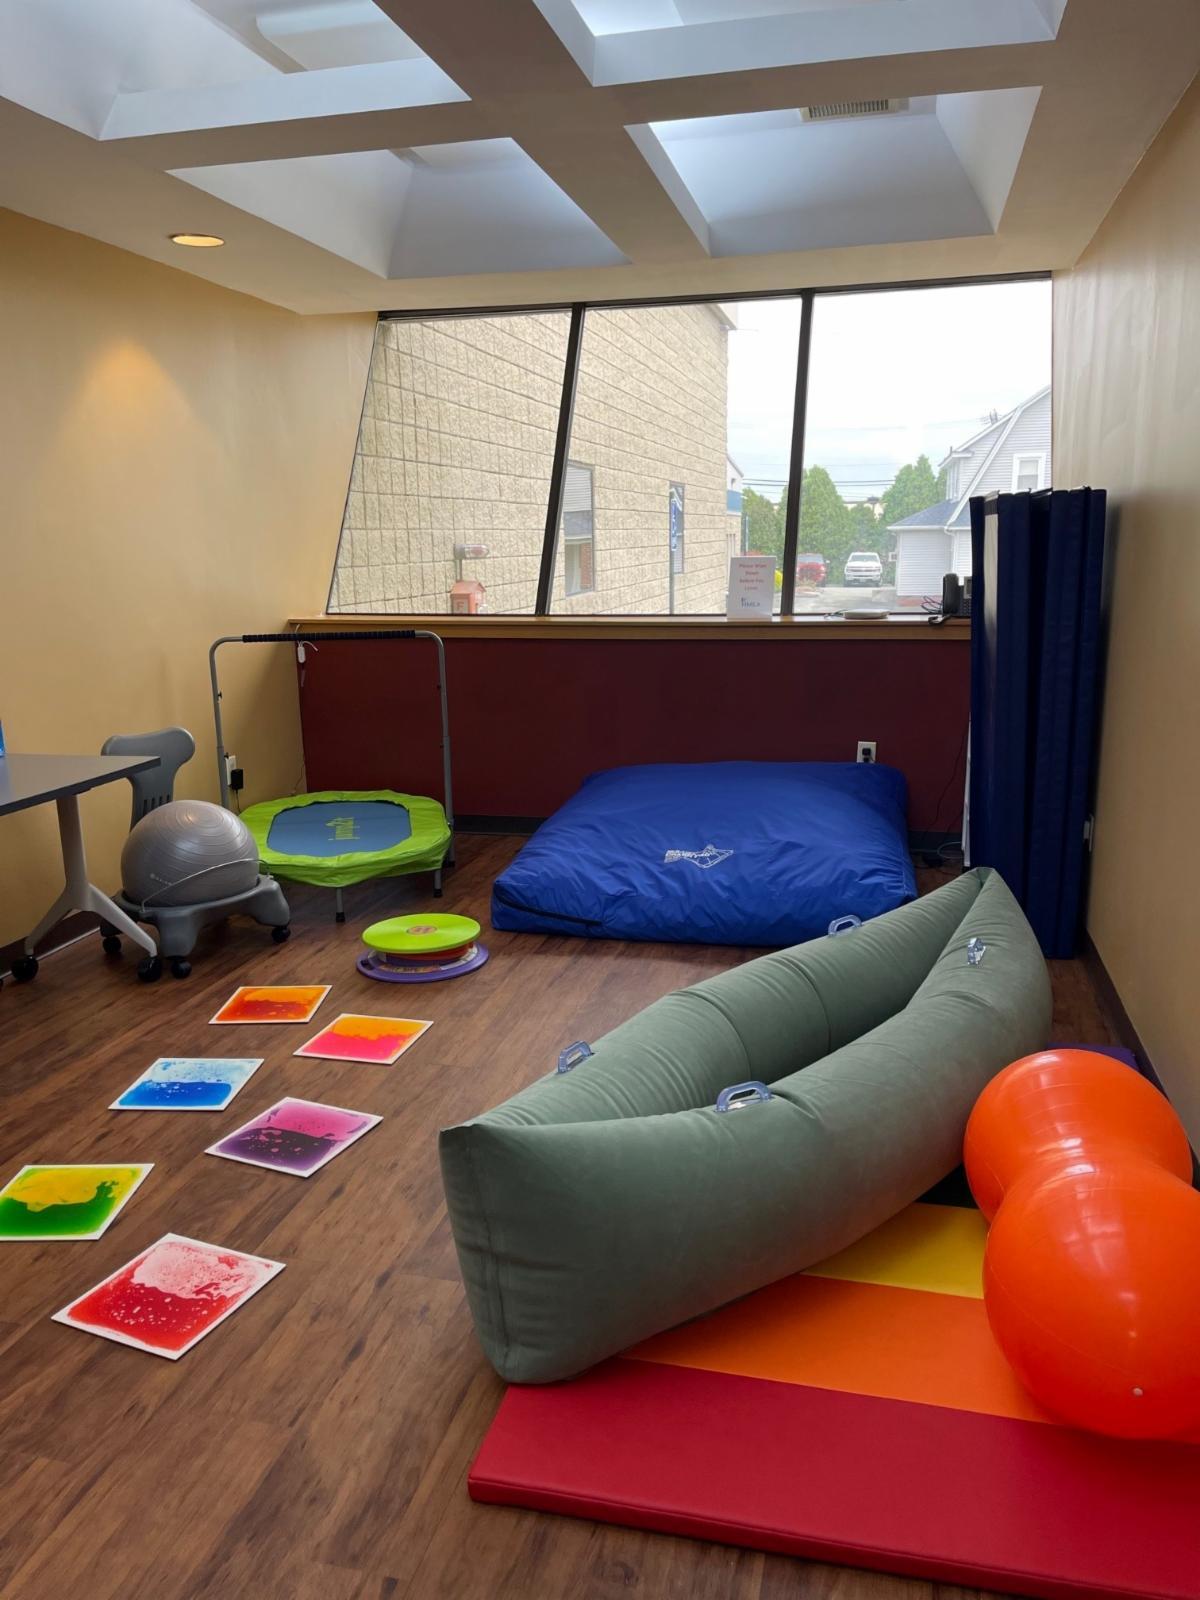 Sensory Treatment Room at TechACCESS